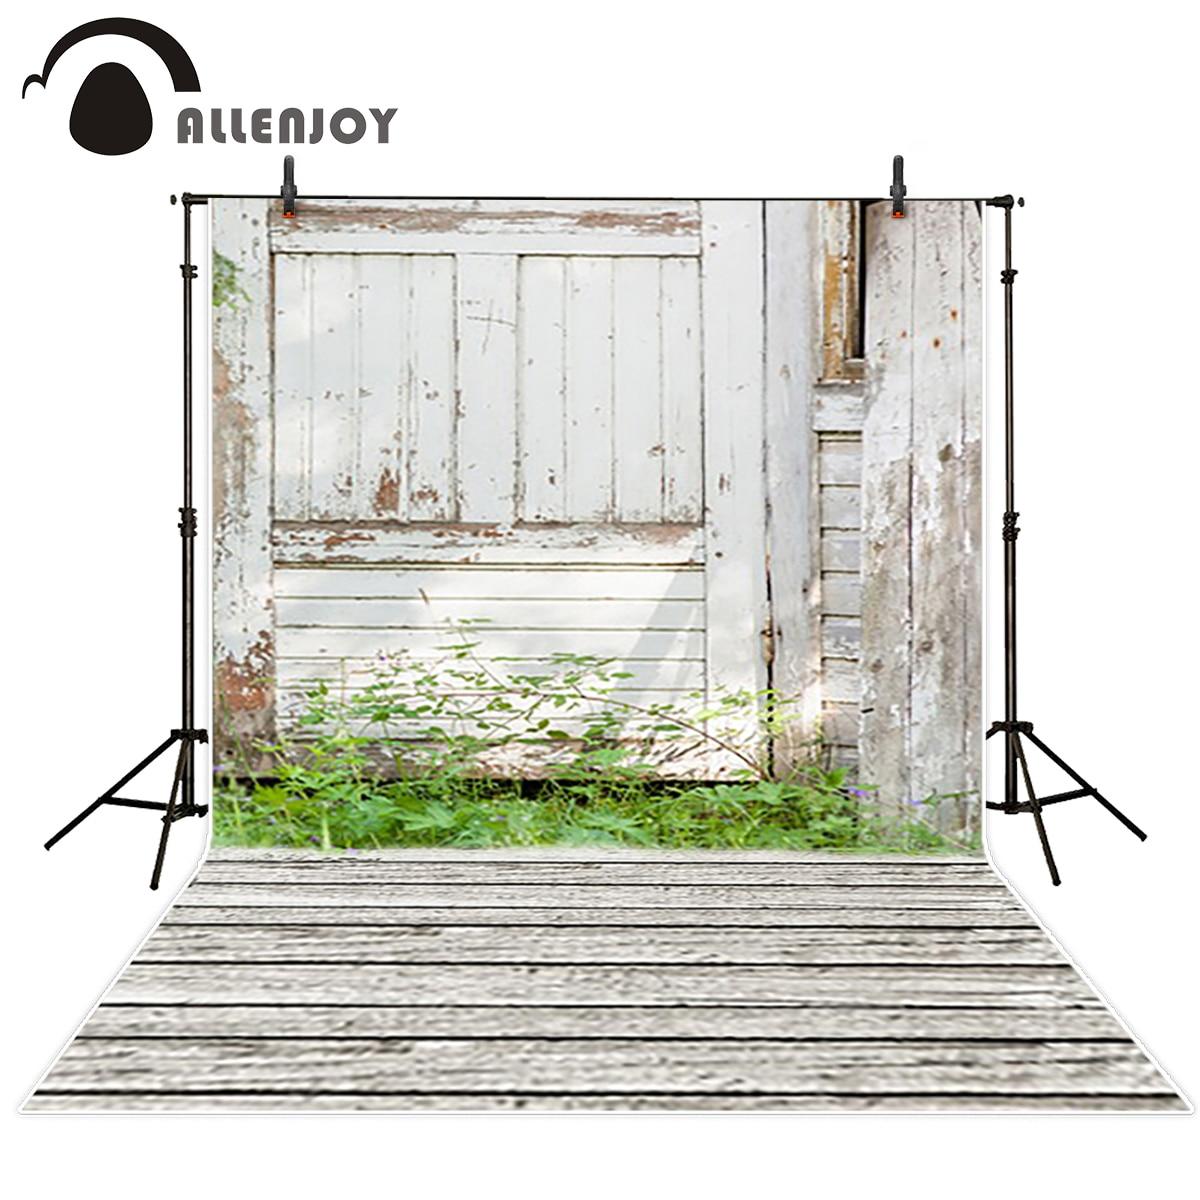 Allenjoy font b photo b font background White wood farm with grass fotografia backgrounds for font